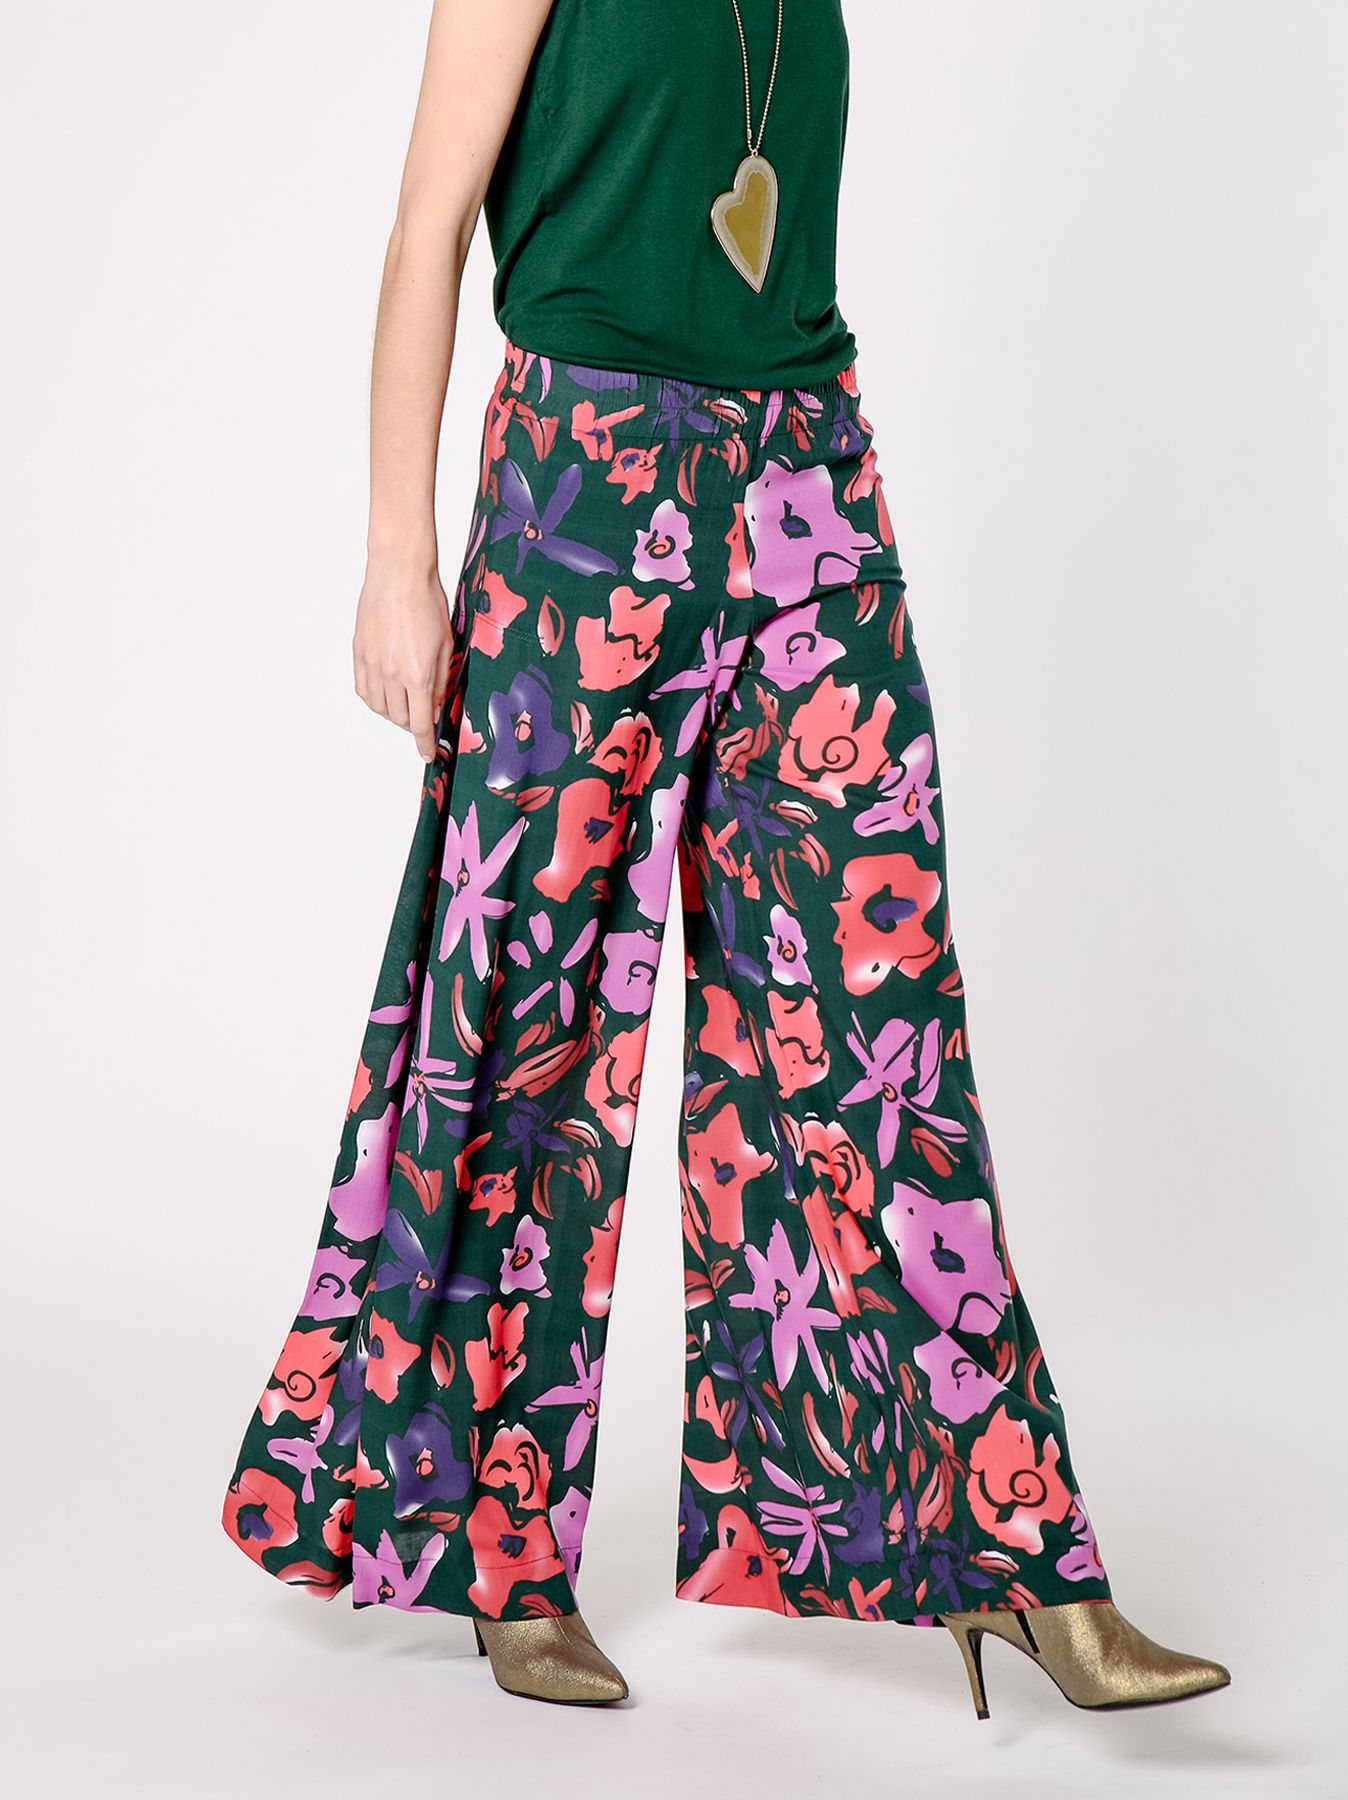 Pantalone palazzo con fantasia floreale